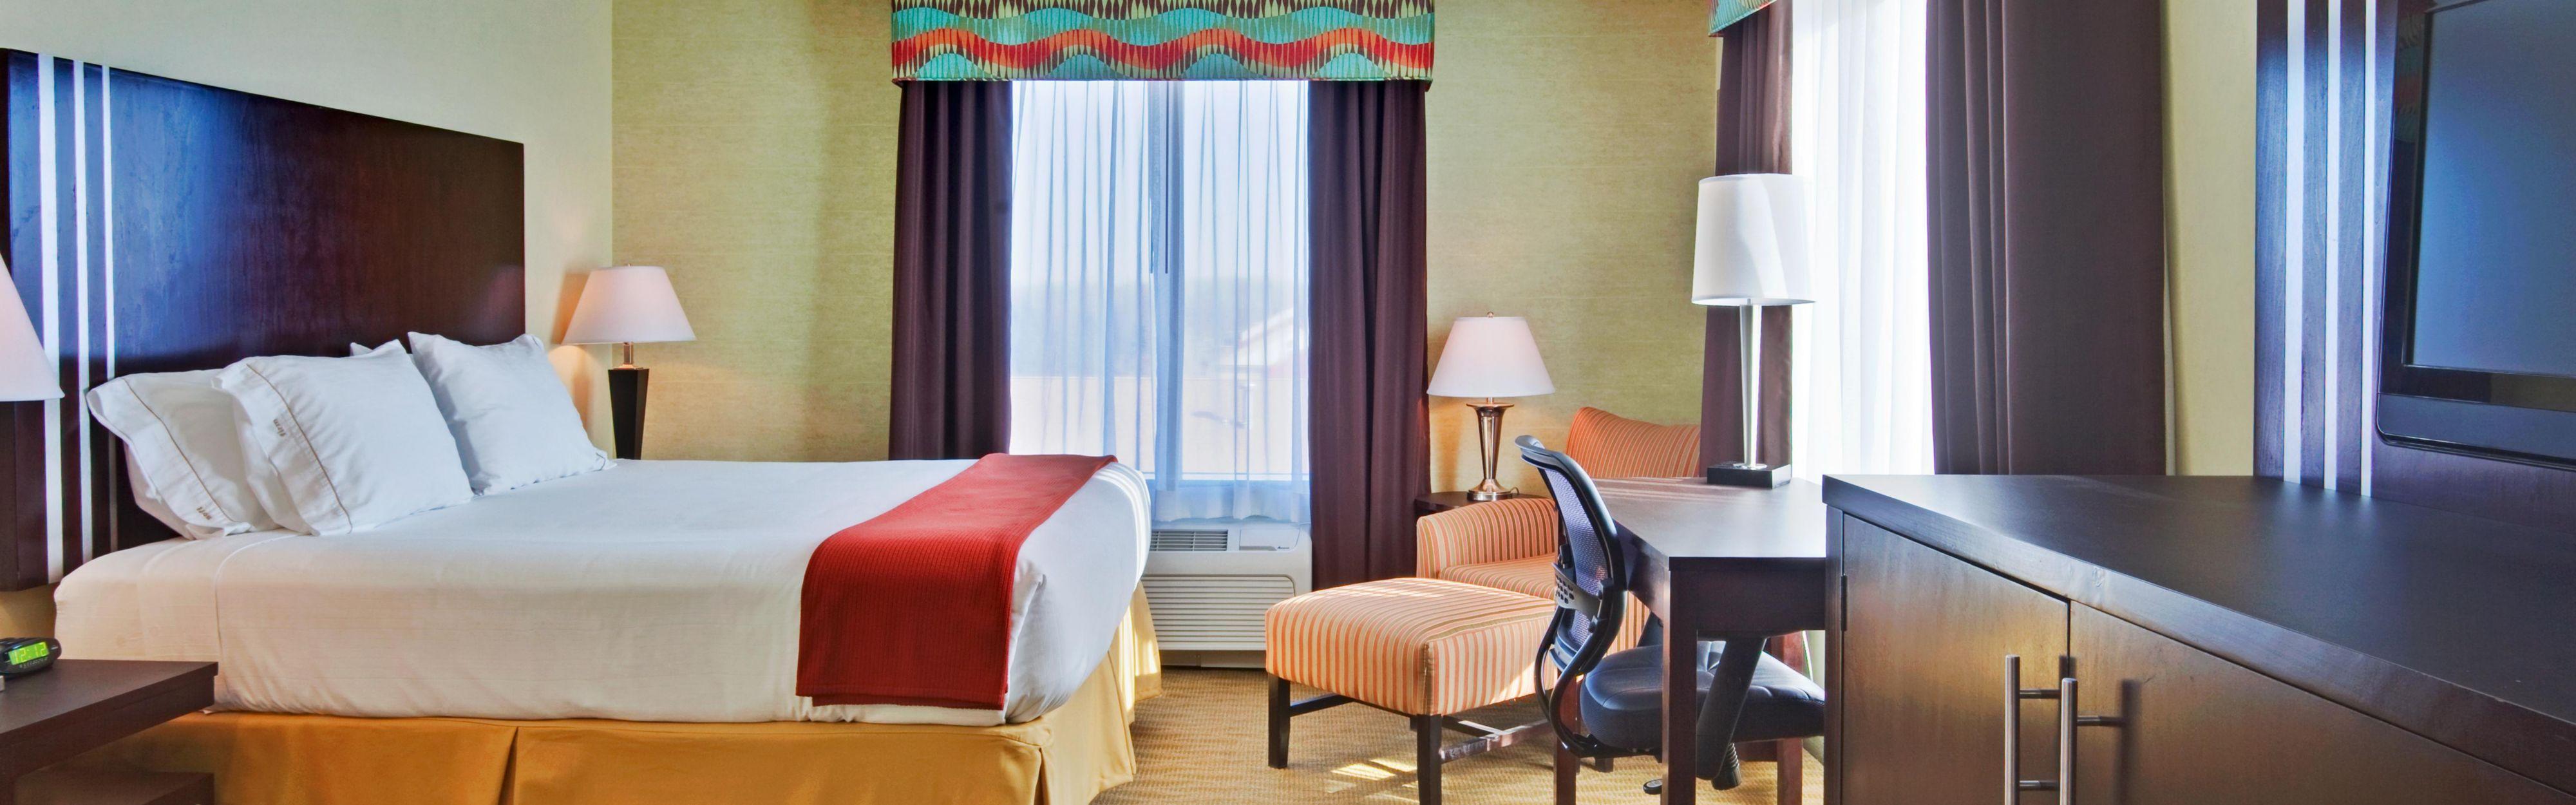 Holiday Inn Express & Suites Hamburg image 1